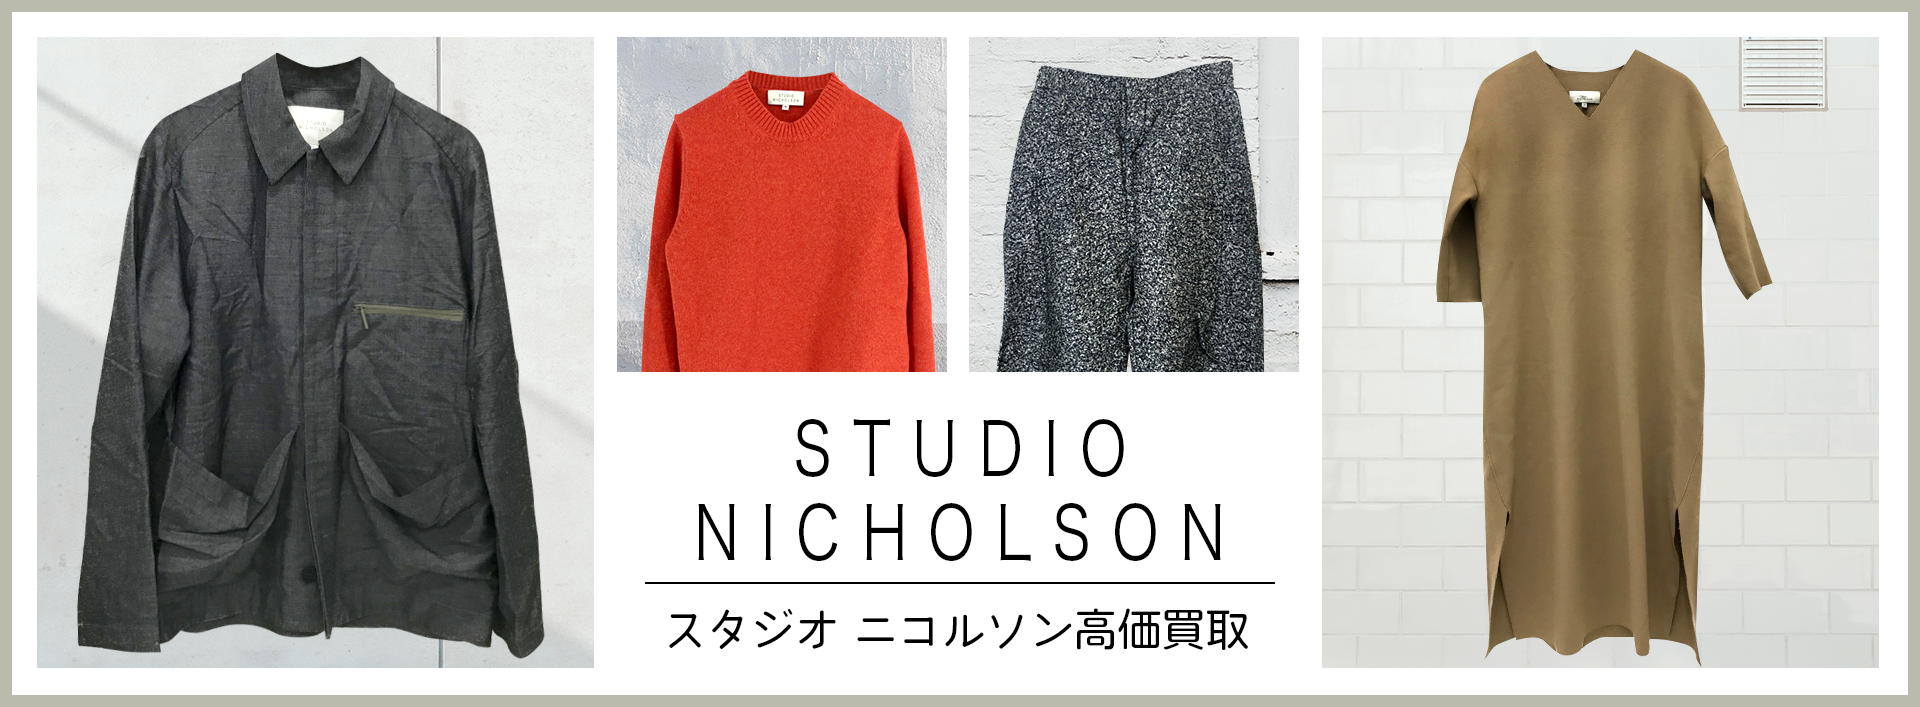 STUDIO NICHOLSON(スタジオニコルソン)高価買取